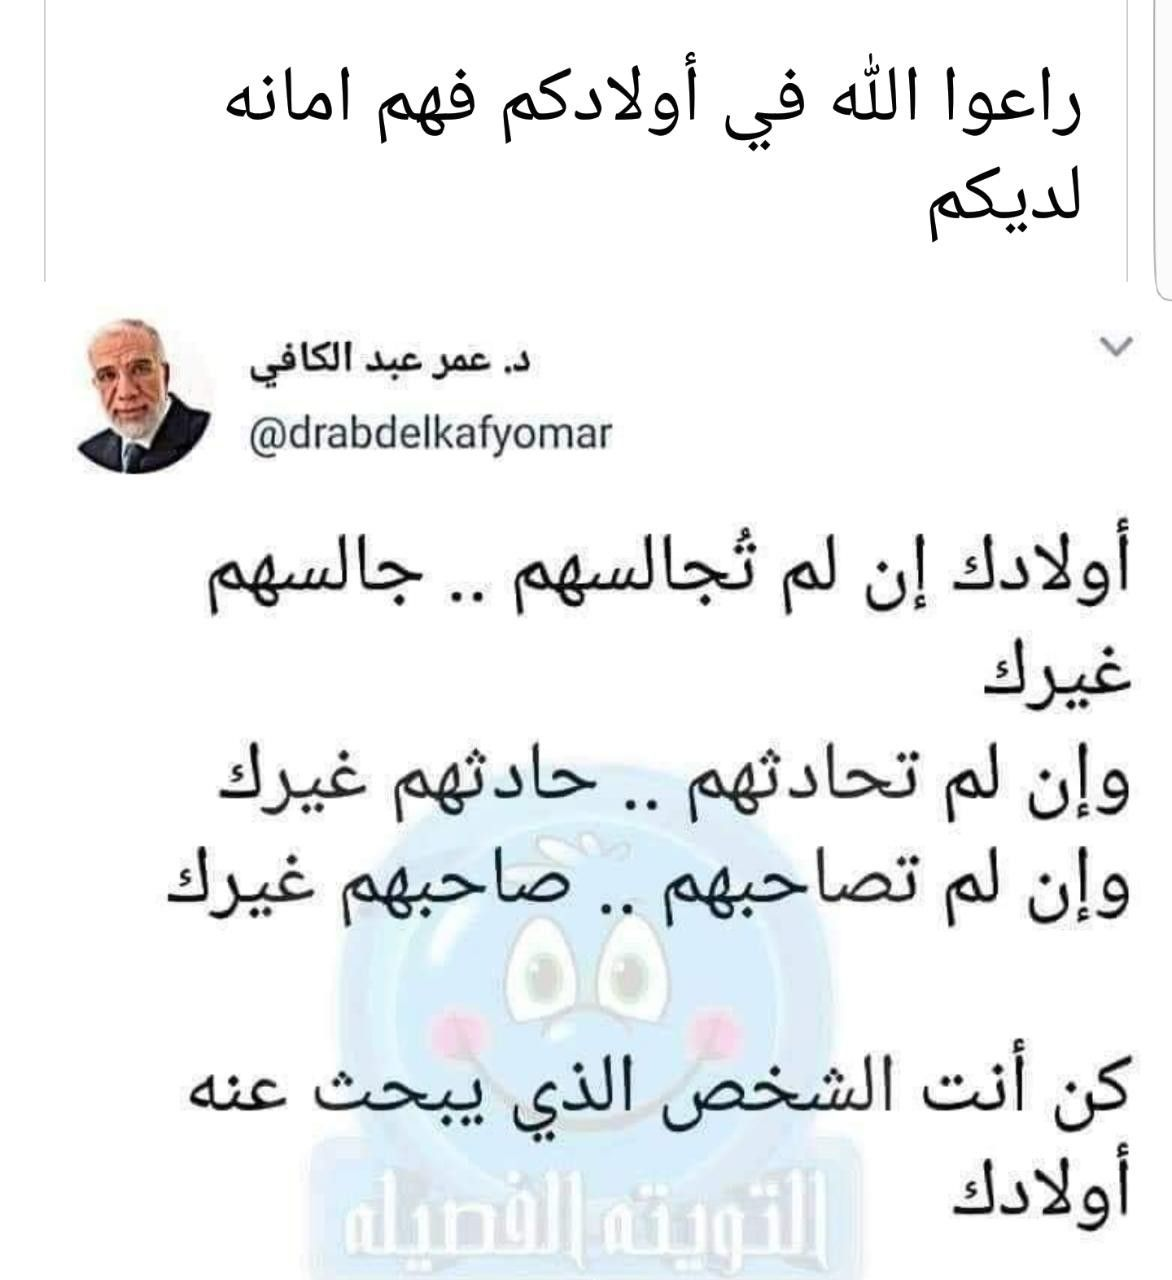 Pin By Nadinekattih On نصاٸح في تربیة الأولاد Words Beautiful Words Arabic Quotes